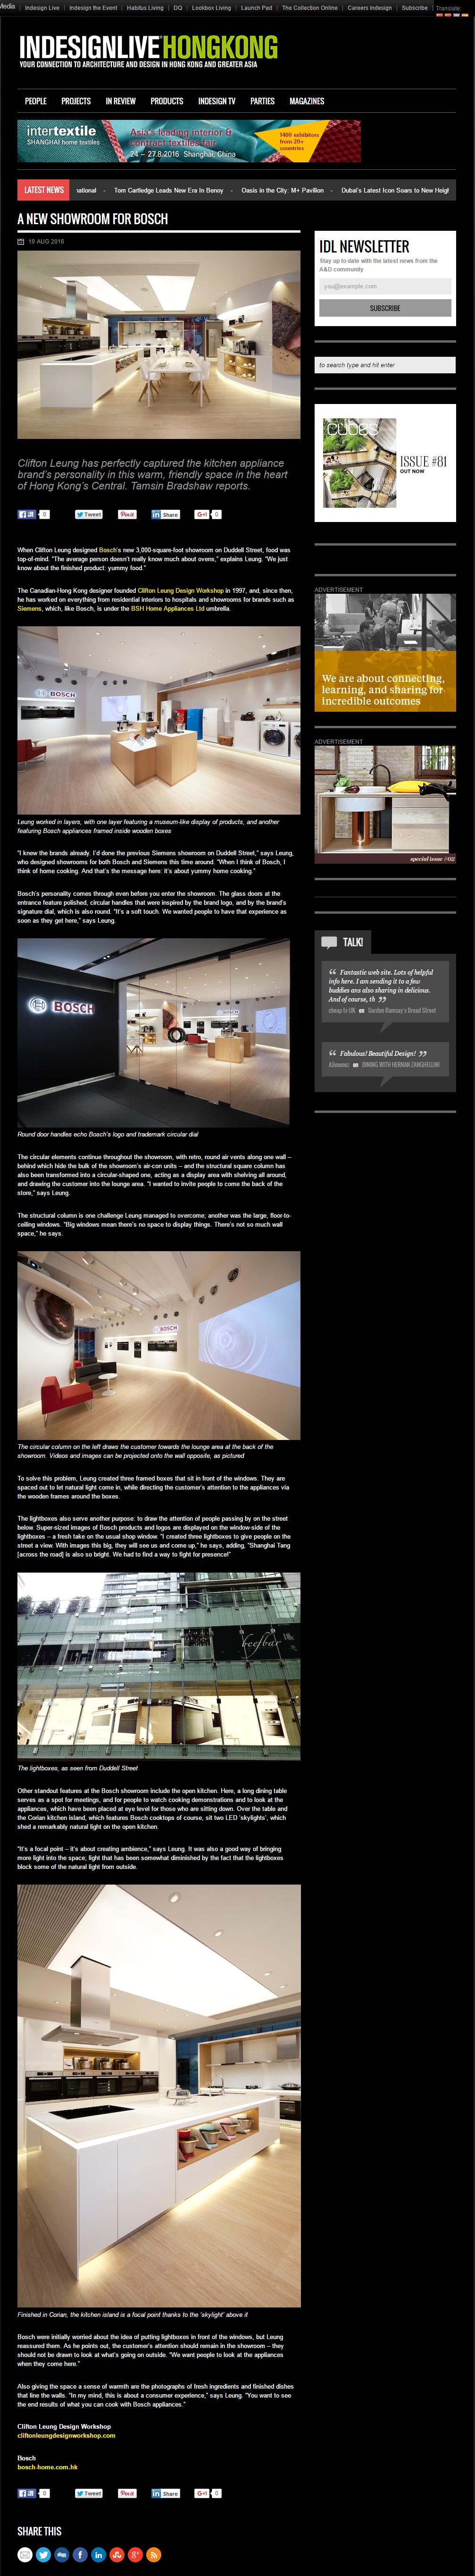 Bosch Showroom  indesignlive  Aug 2016